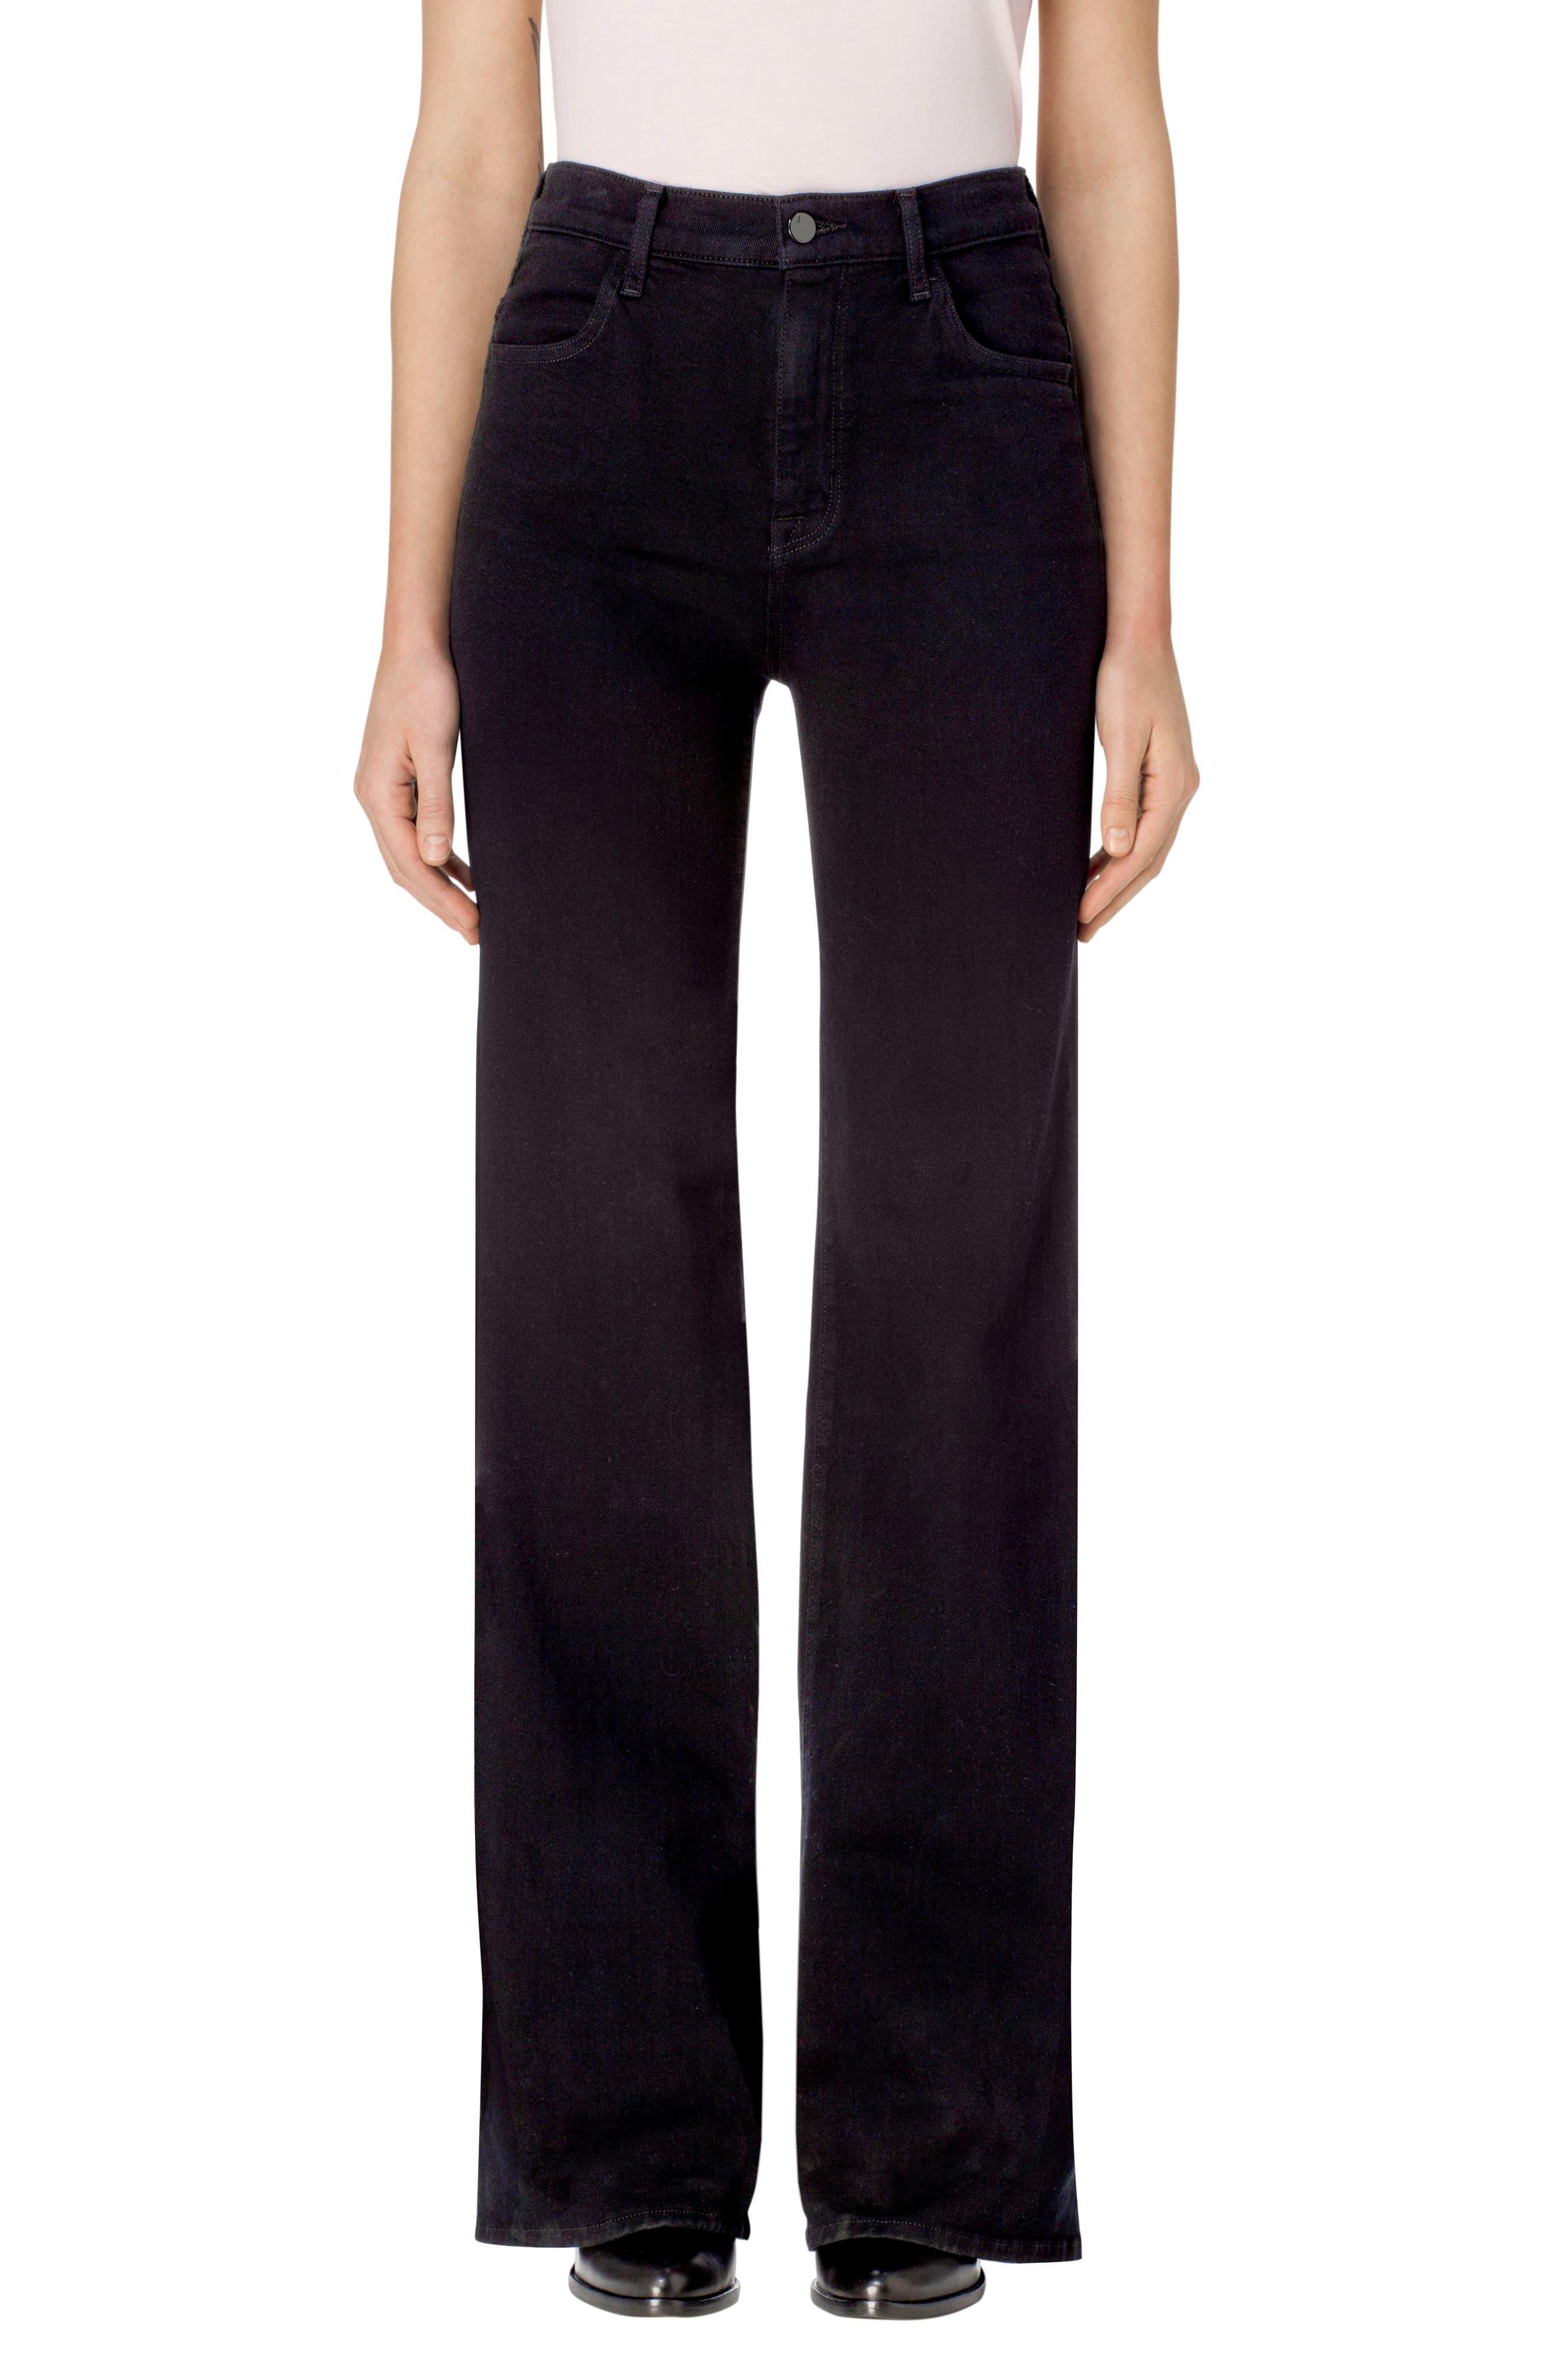 Joan High Waist Wide Leg Jeans,                         Main,                         color, Pitch Black